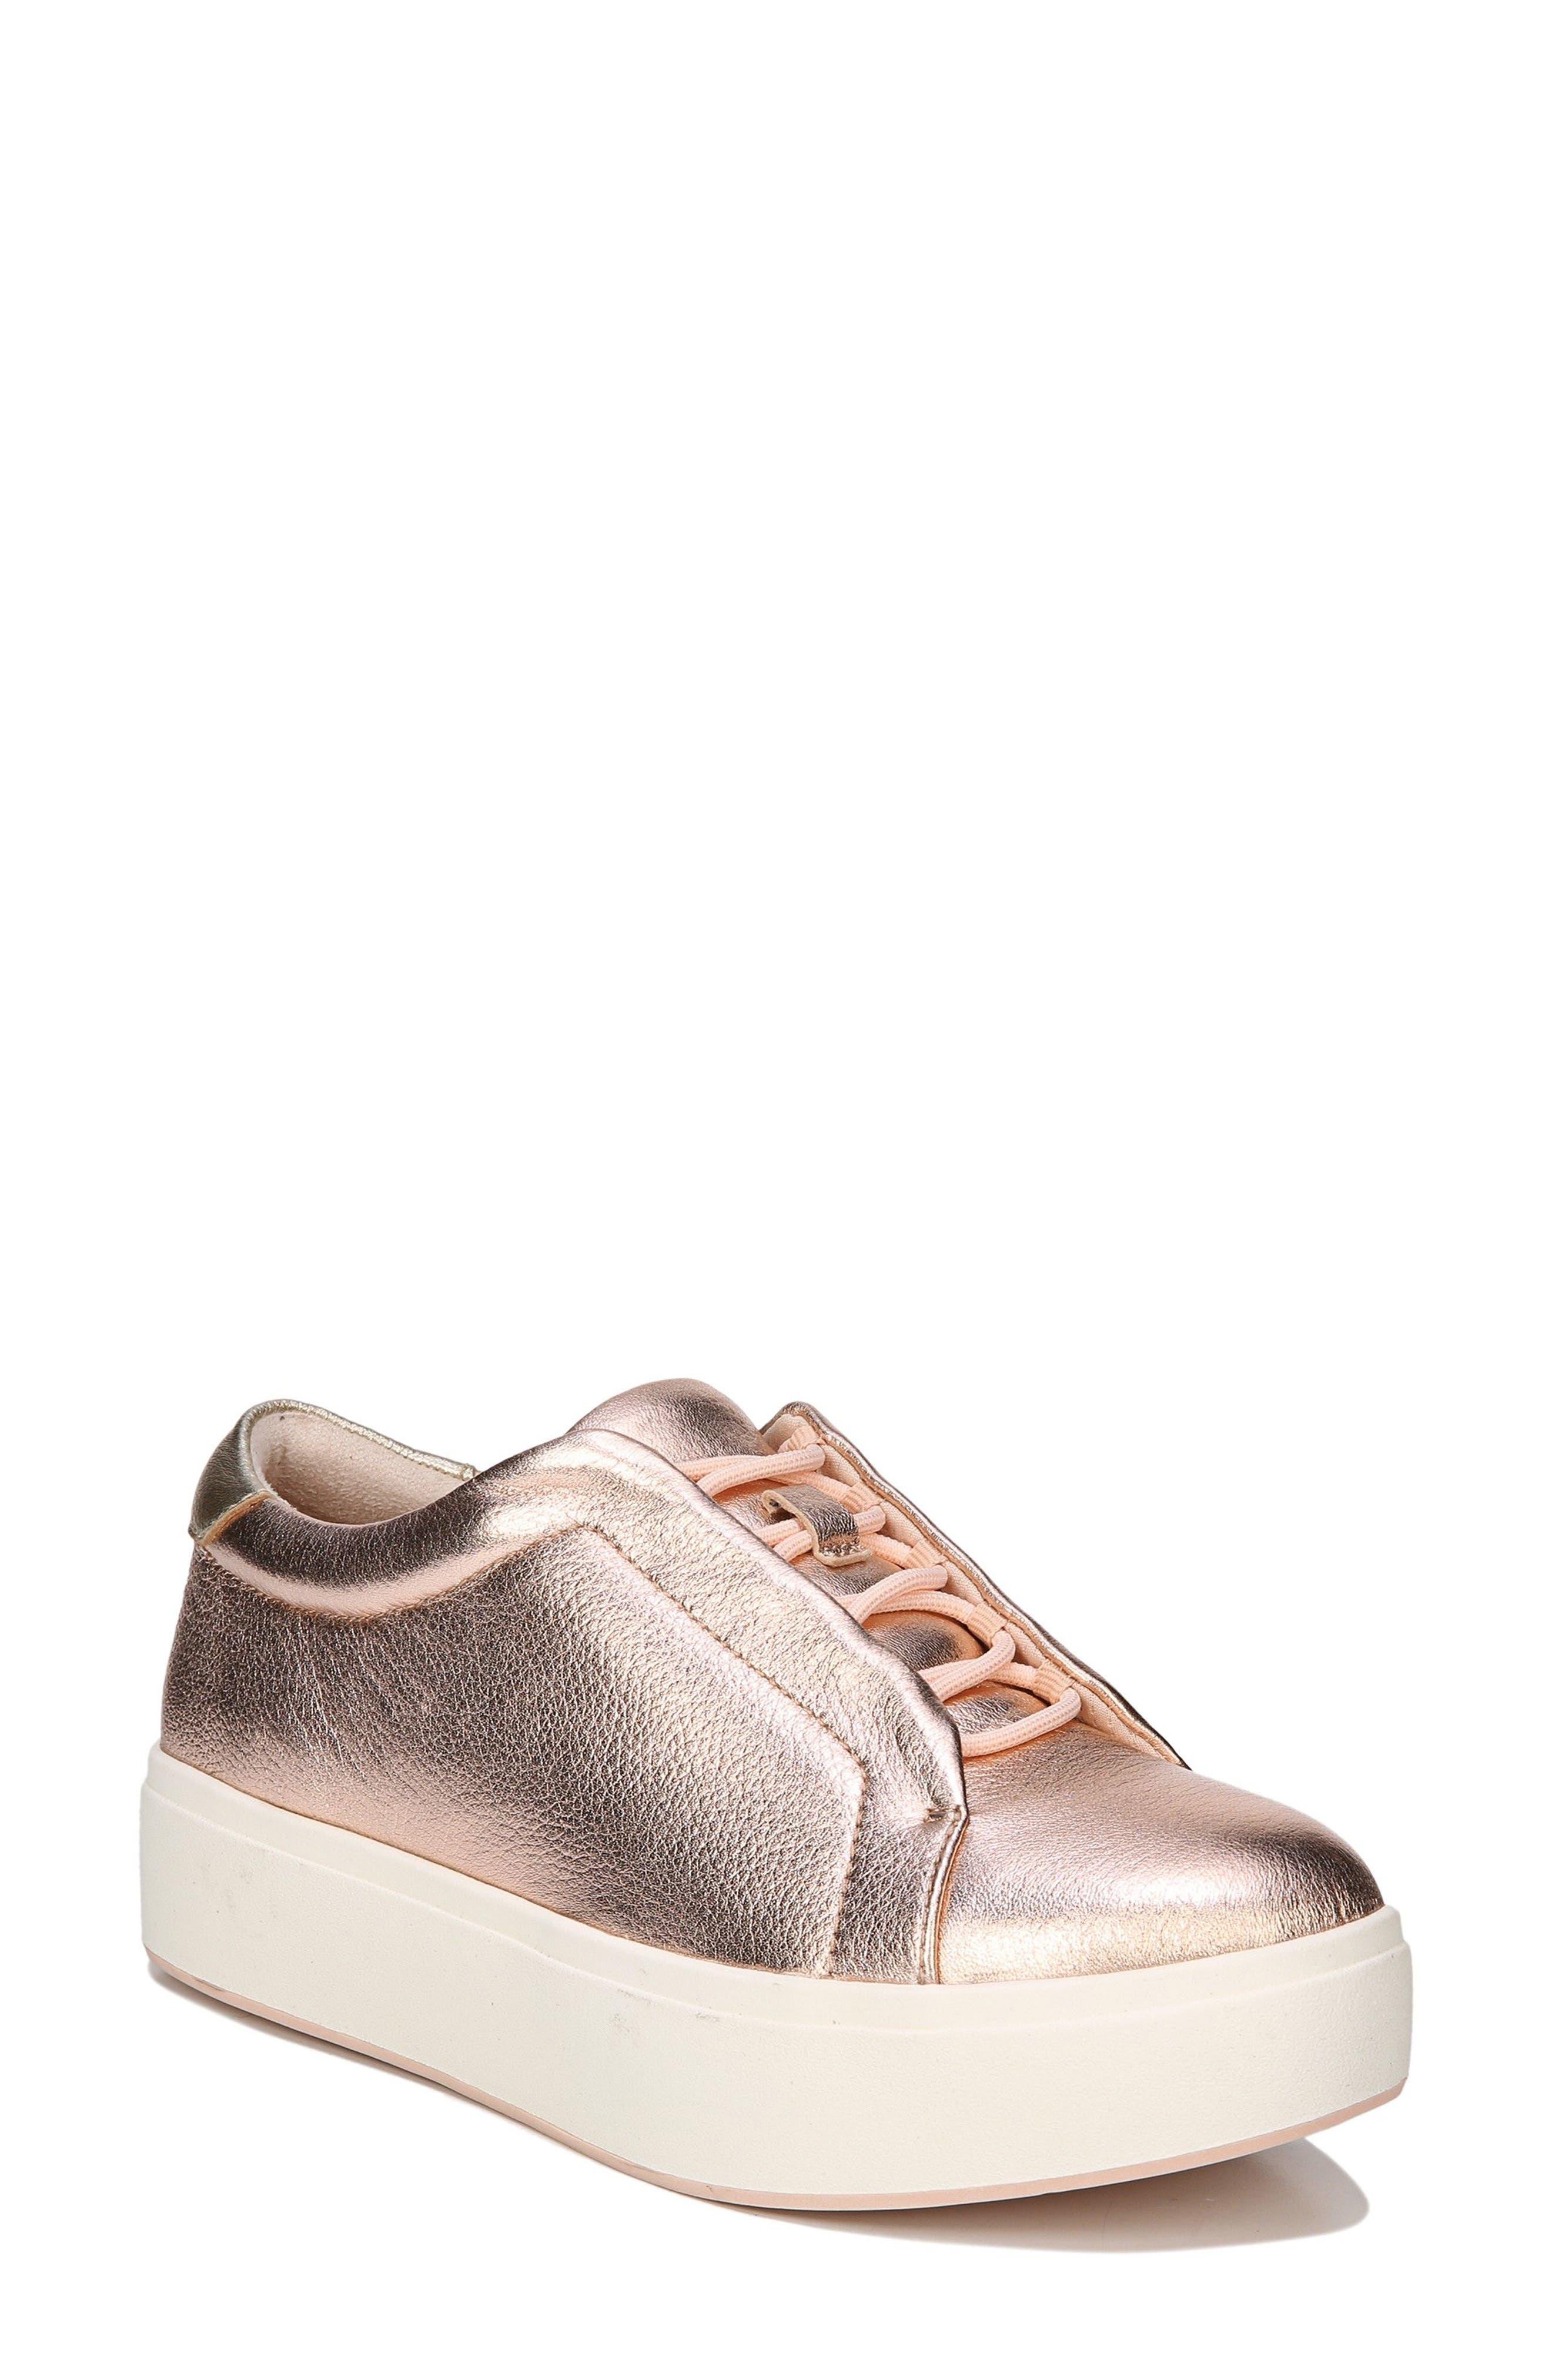 Abbot Sneaker,                             Main thumbnail 1, color,                             Primrose Leather